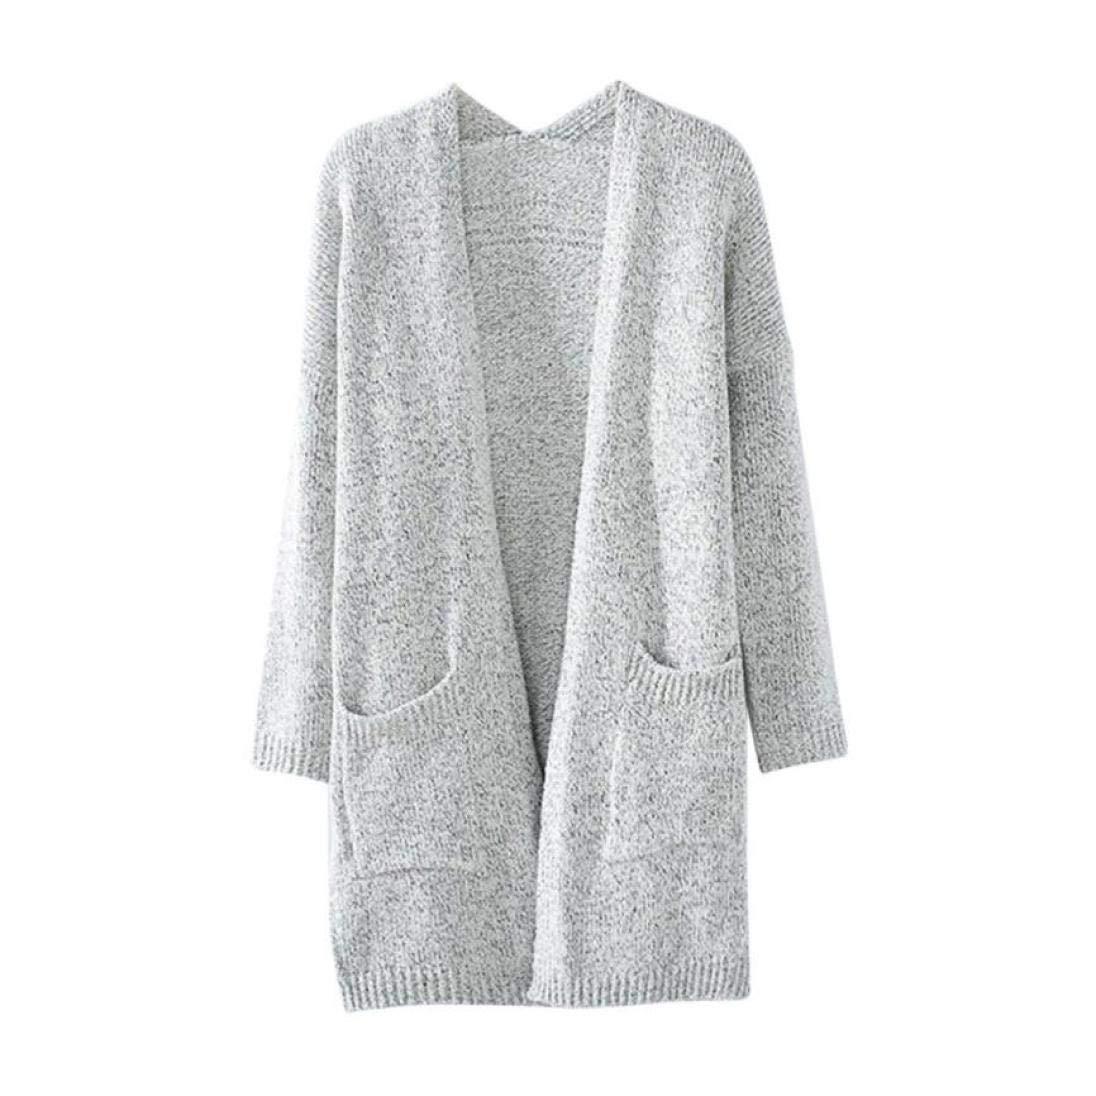 FIRERO Womens Lady Casual Knit Sleeve Sweater Coat Cardigan Jacket